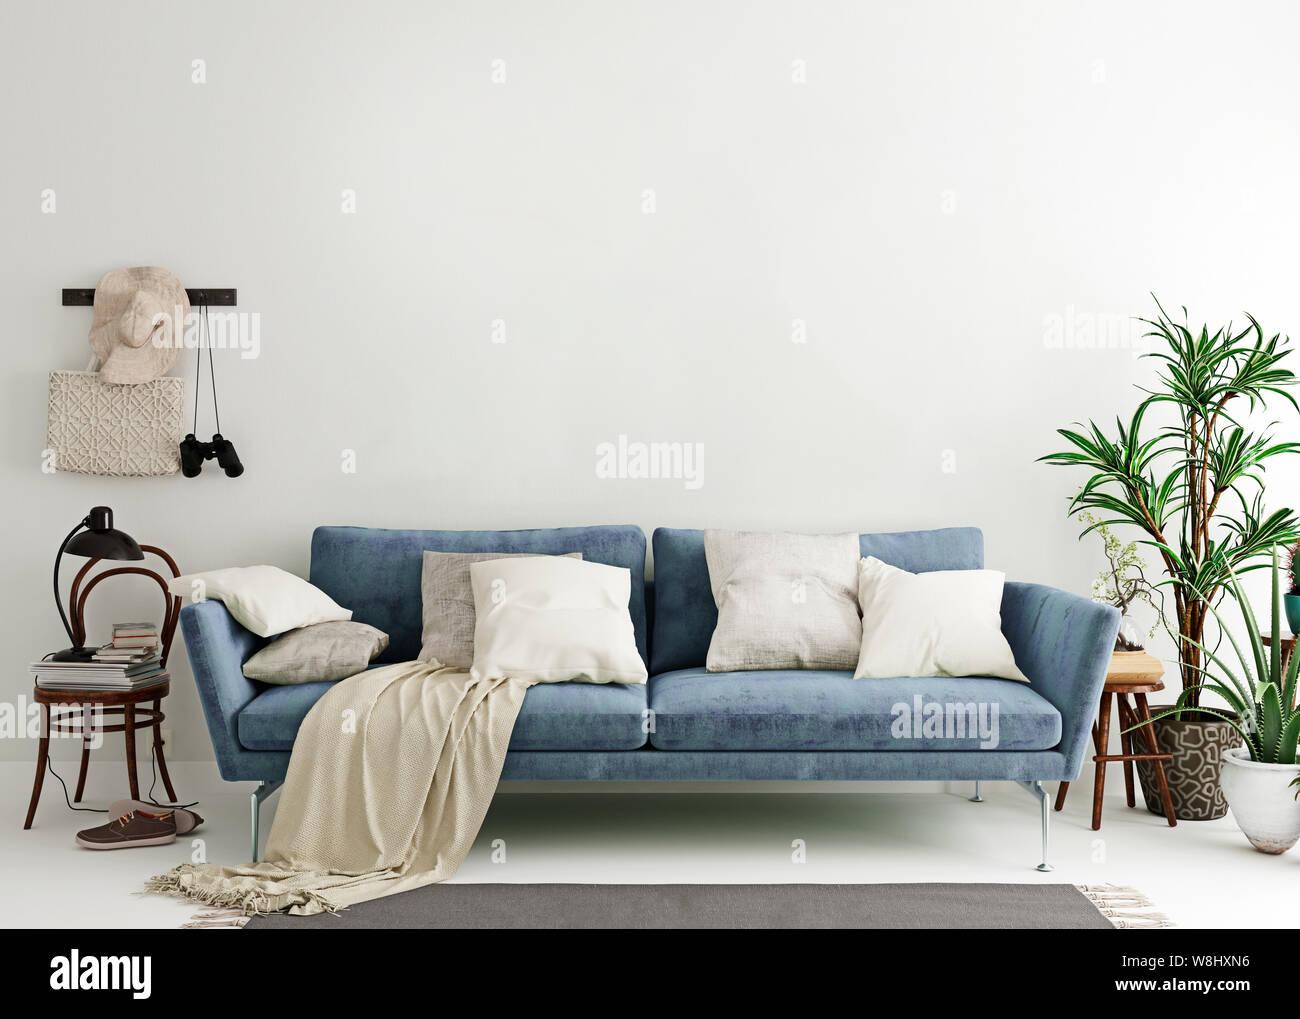 Peachy Mock Up Wall In Steel Blue Modern Interior Background Inzonedesignstudio Interior Chair Design Inzonedesignstudiocom